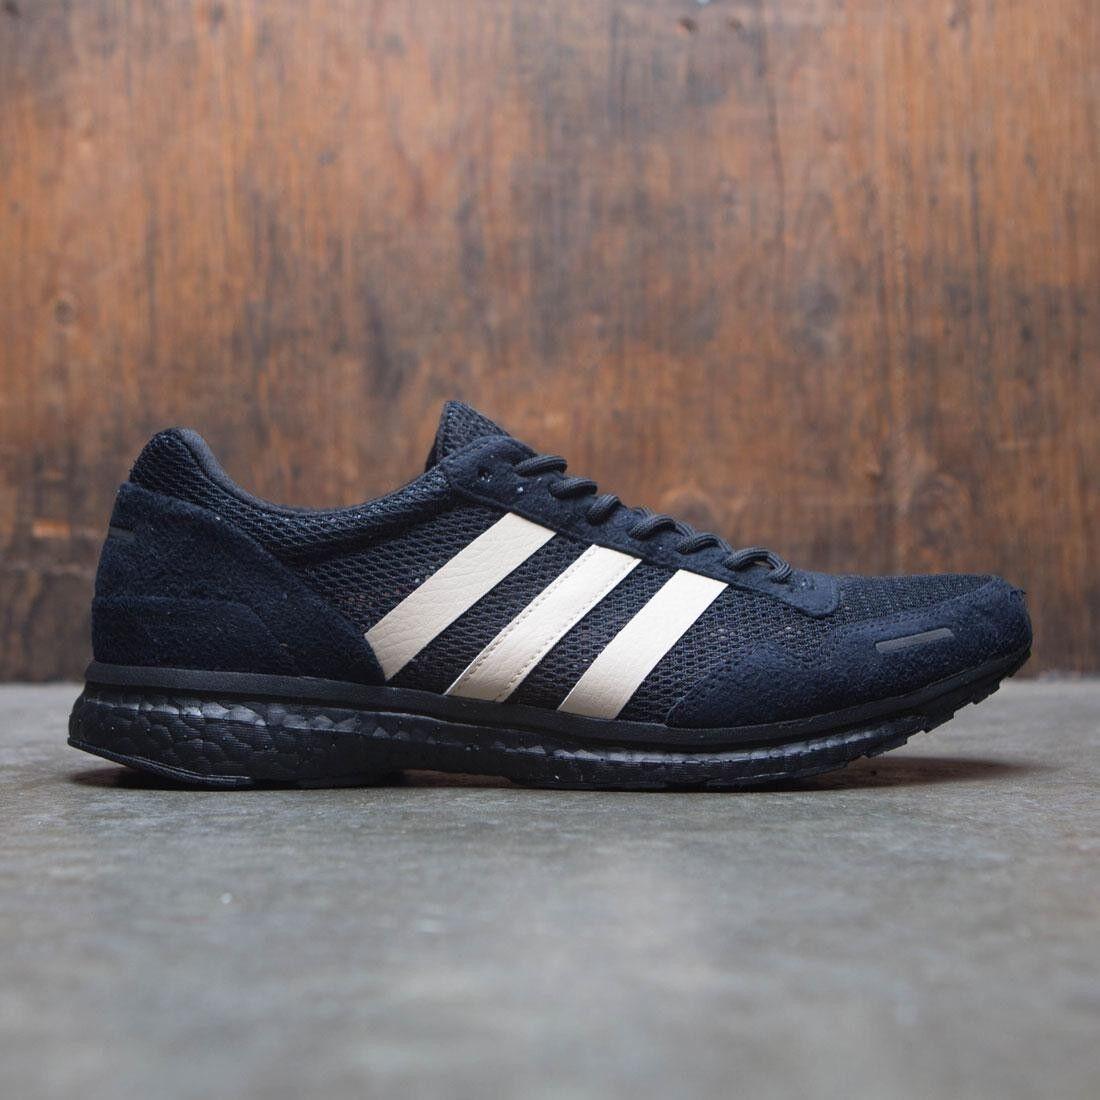 Adidas Adizero Adios ultra boost x UNDFTD Size 9. B22483 yeezy undefeated nmd